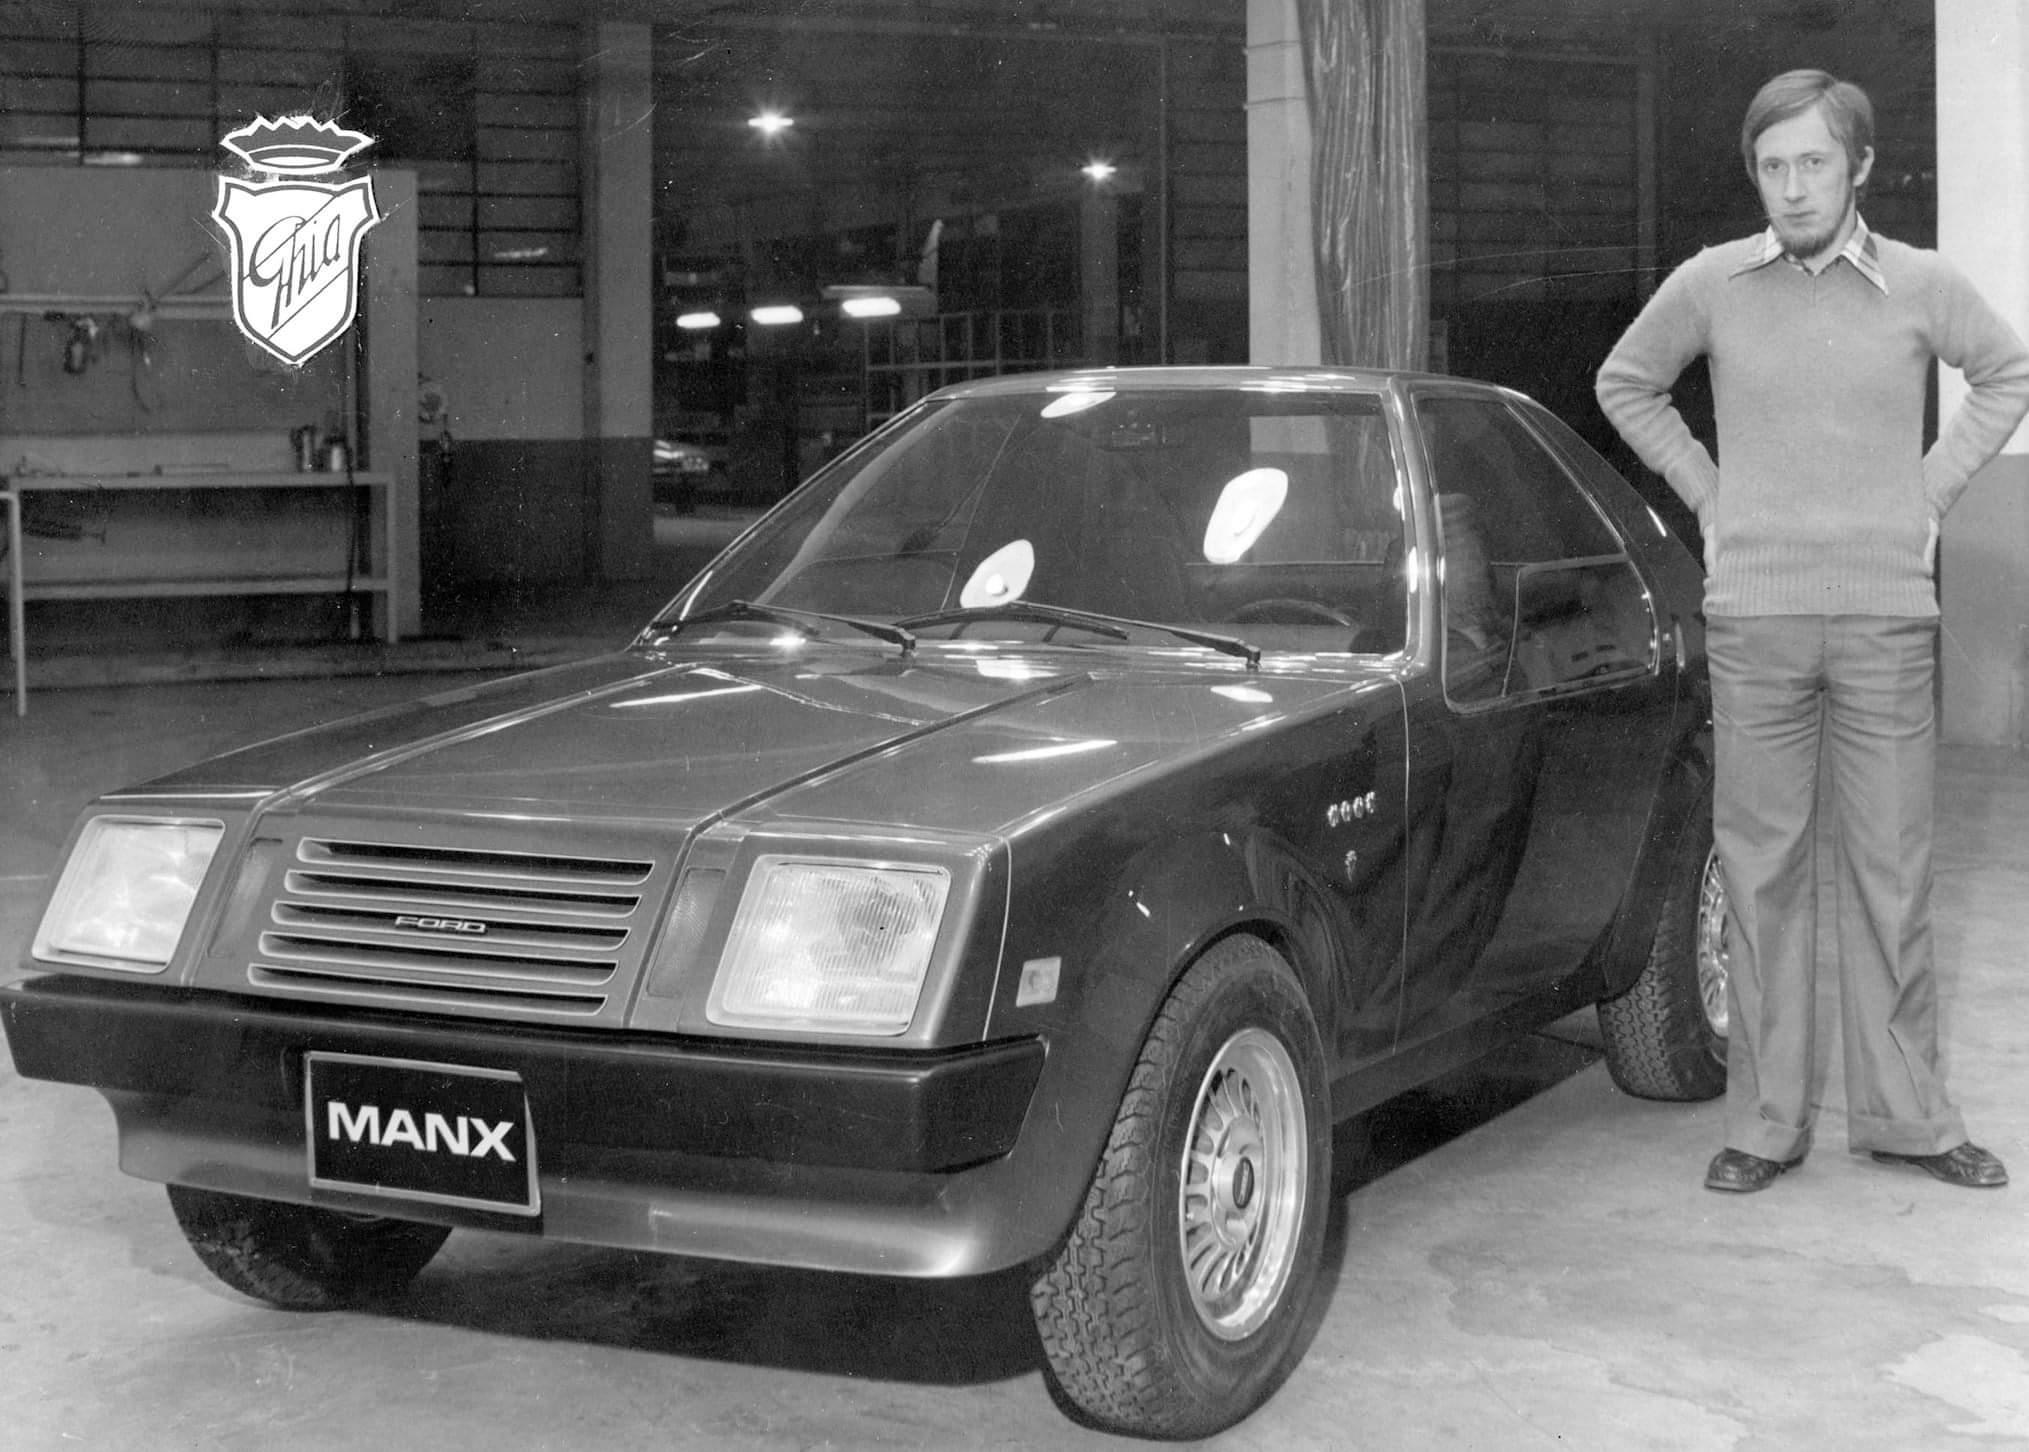 Ford – Manx